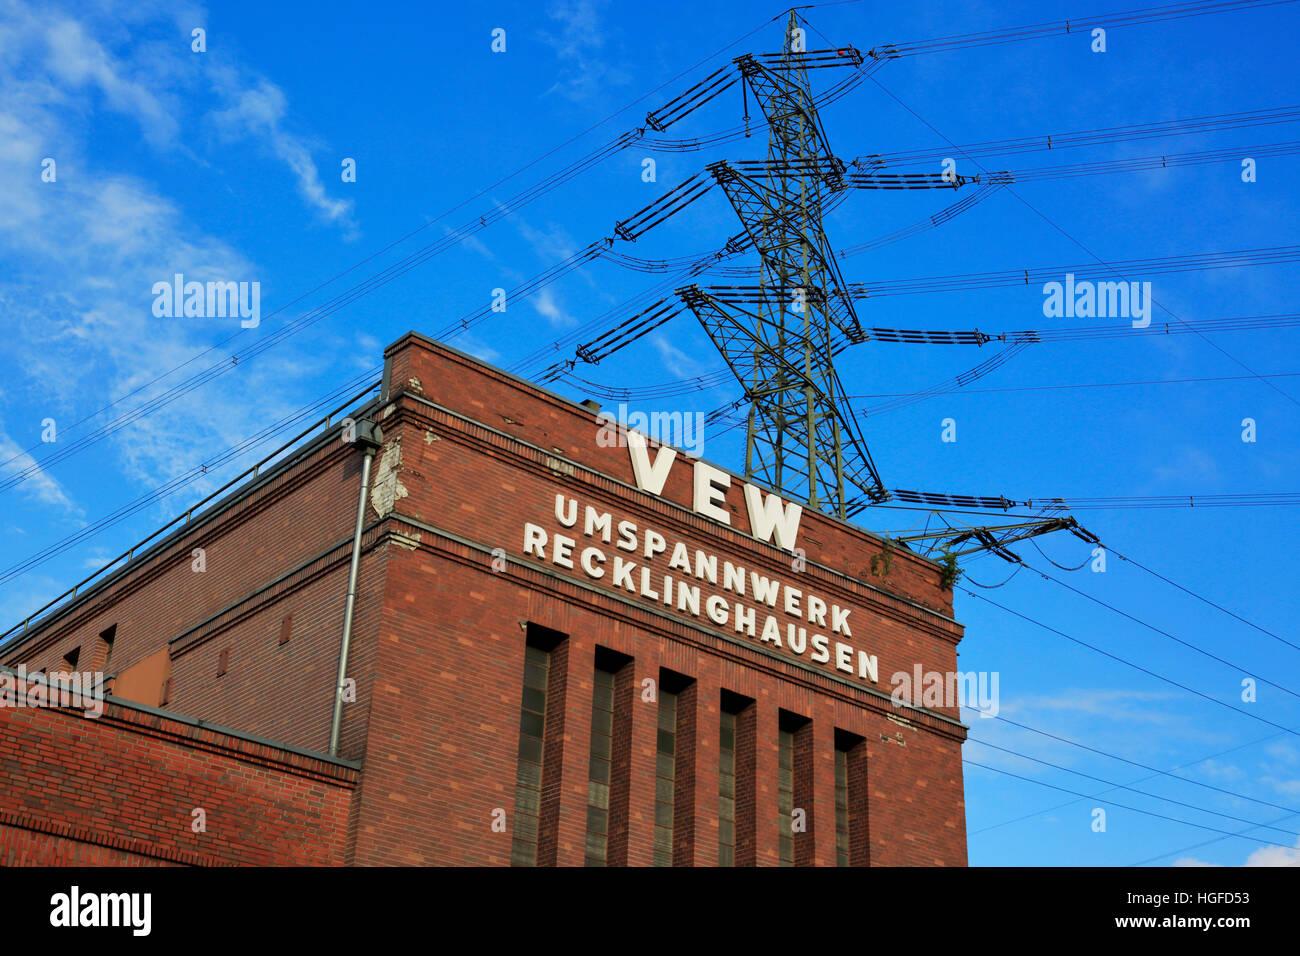 VEW Transformer station Recklinghausen, Ruhr area, North Rhine-Westphalia - Stock Image